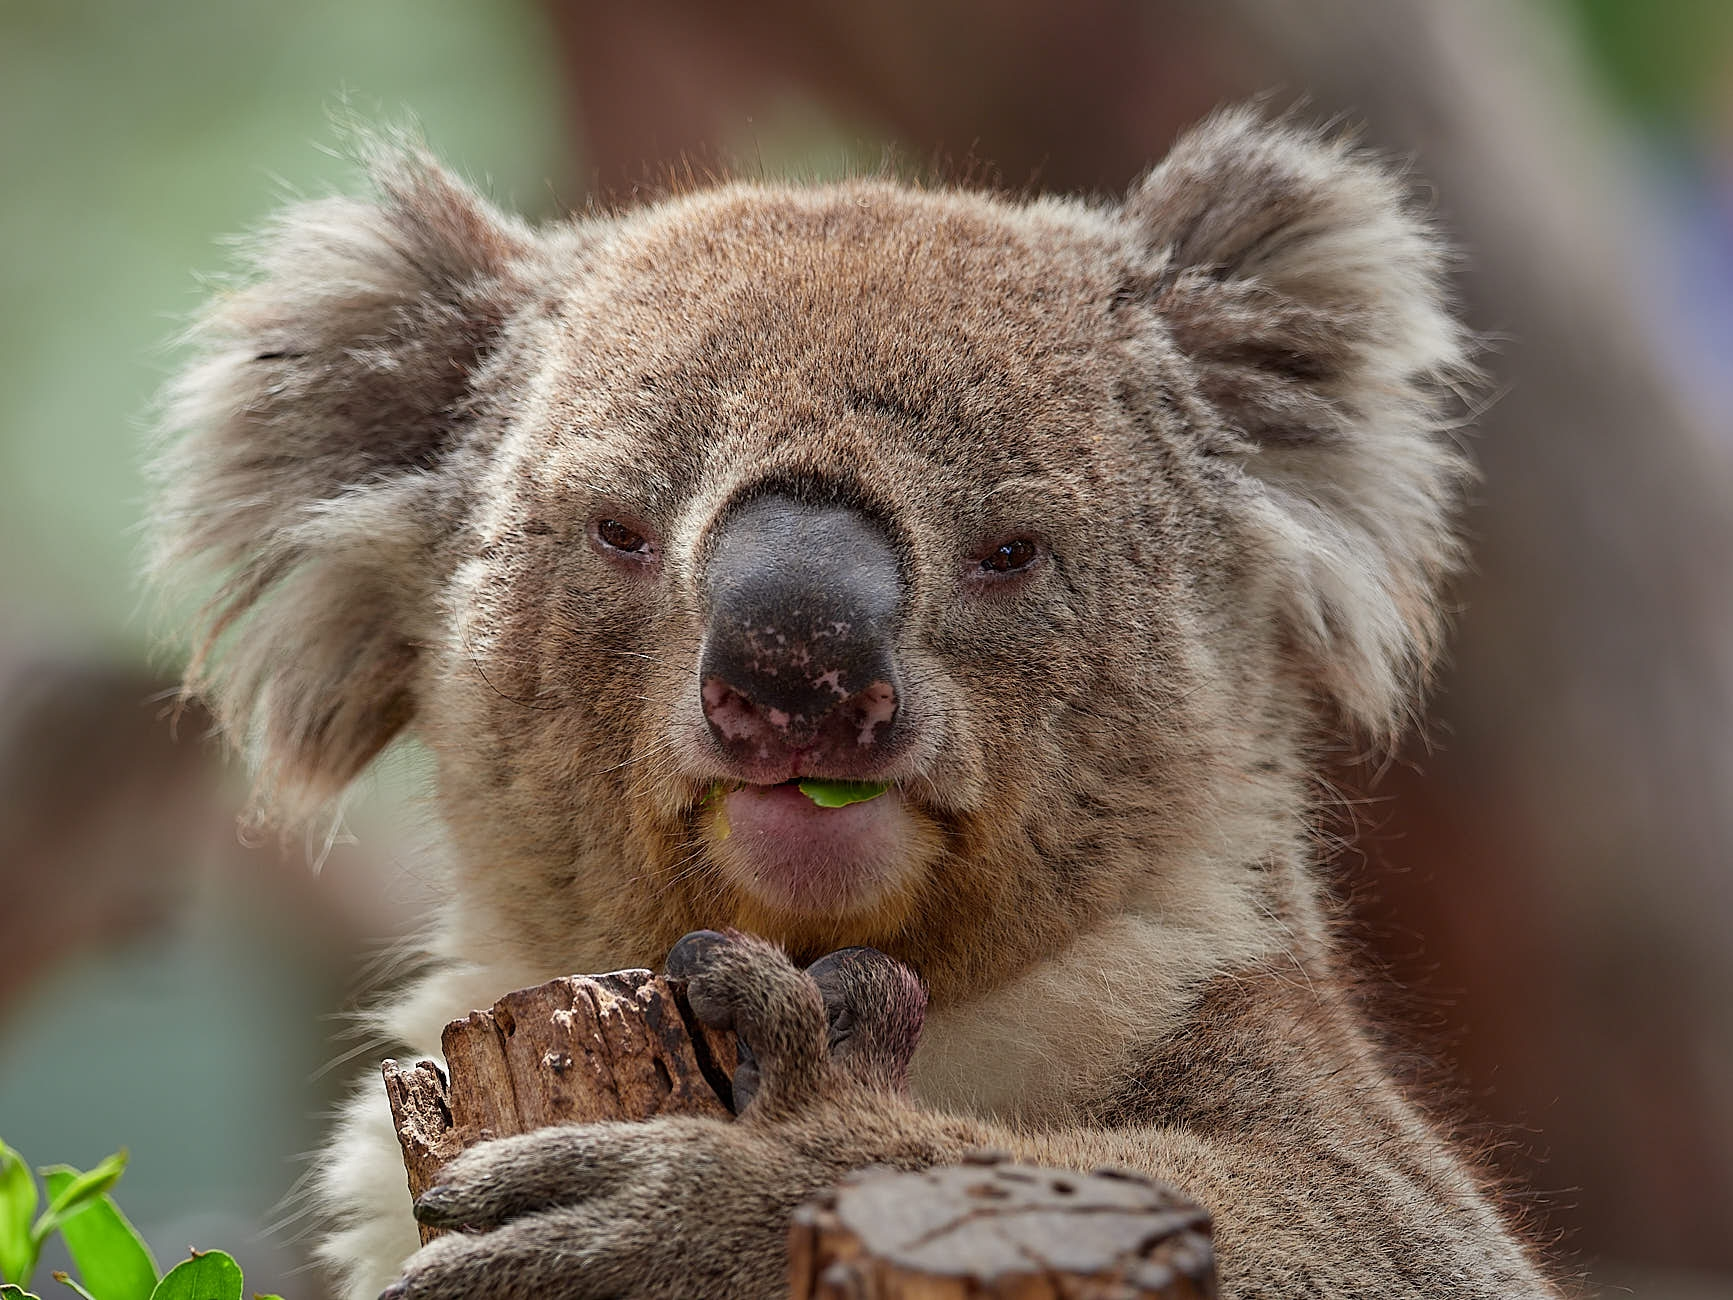 ames Pyne Photography Melbourne, Frankston, Somerville & Mornington Peninsula Photographer